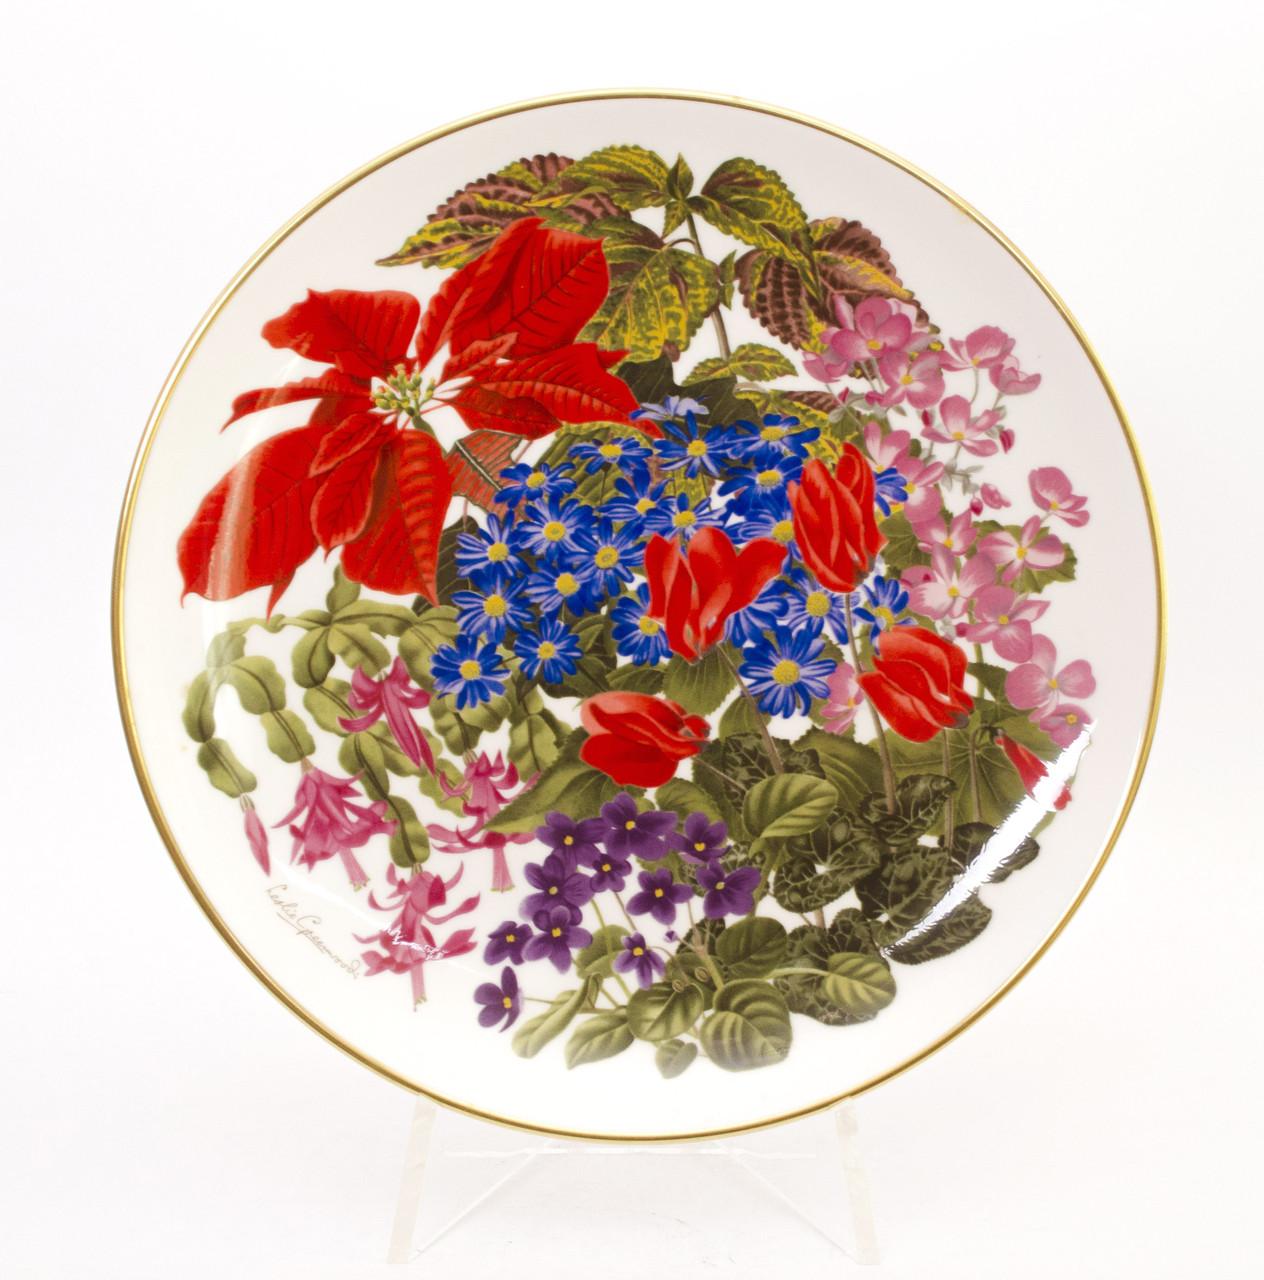 Тарелка коллекционная FRANKLIN PORCELAIN фарфор Англия, декабрь